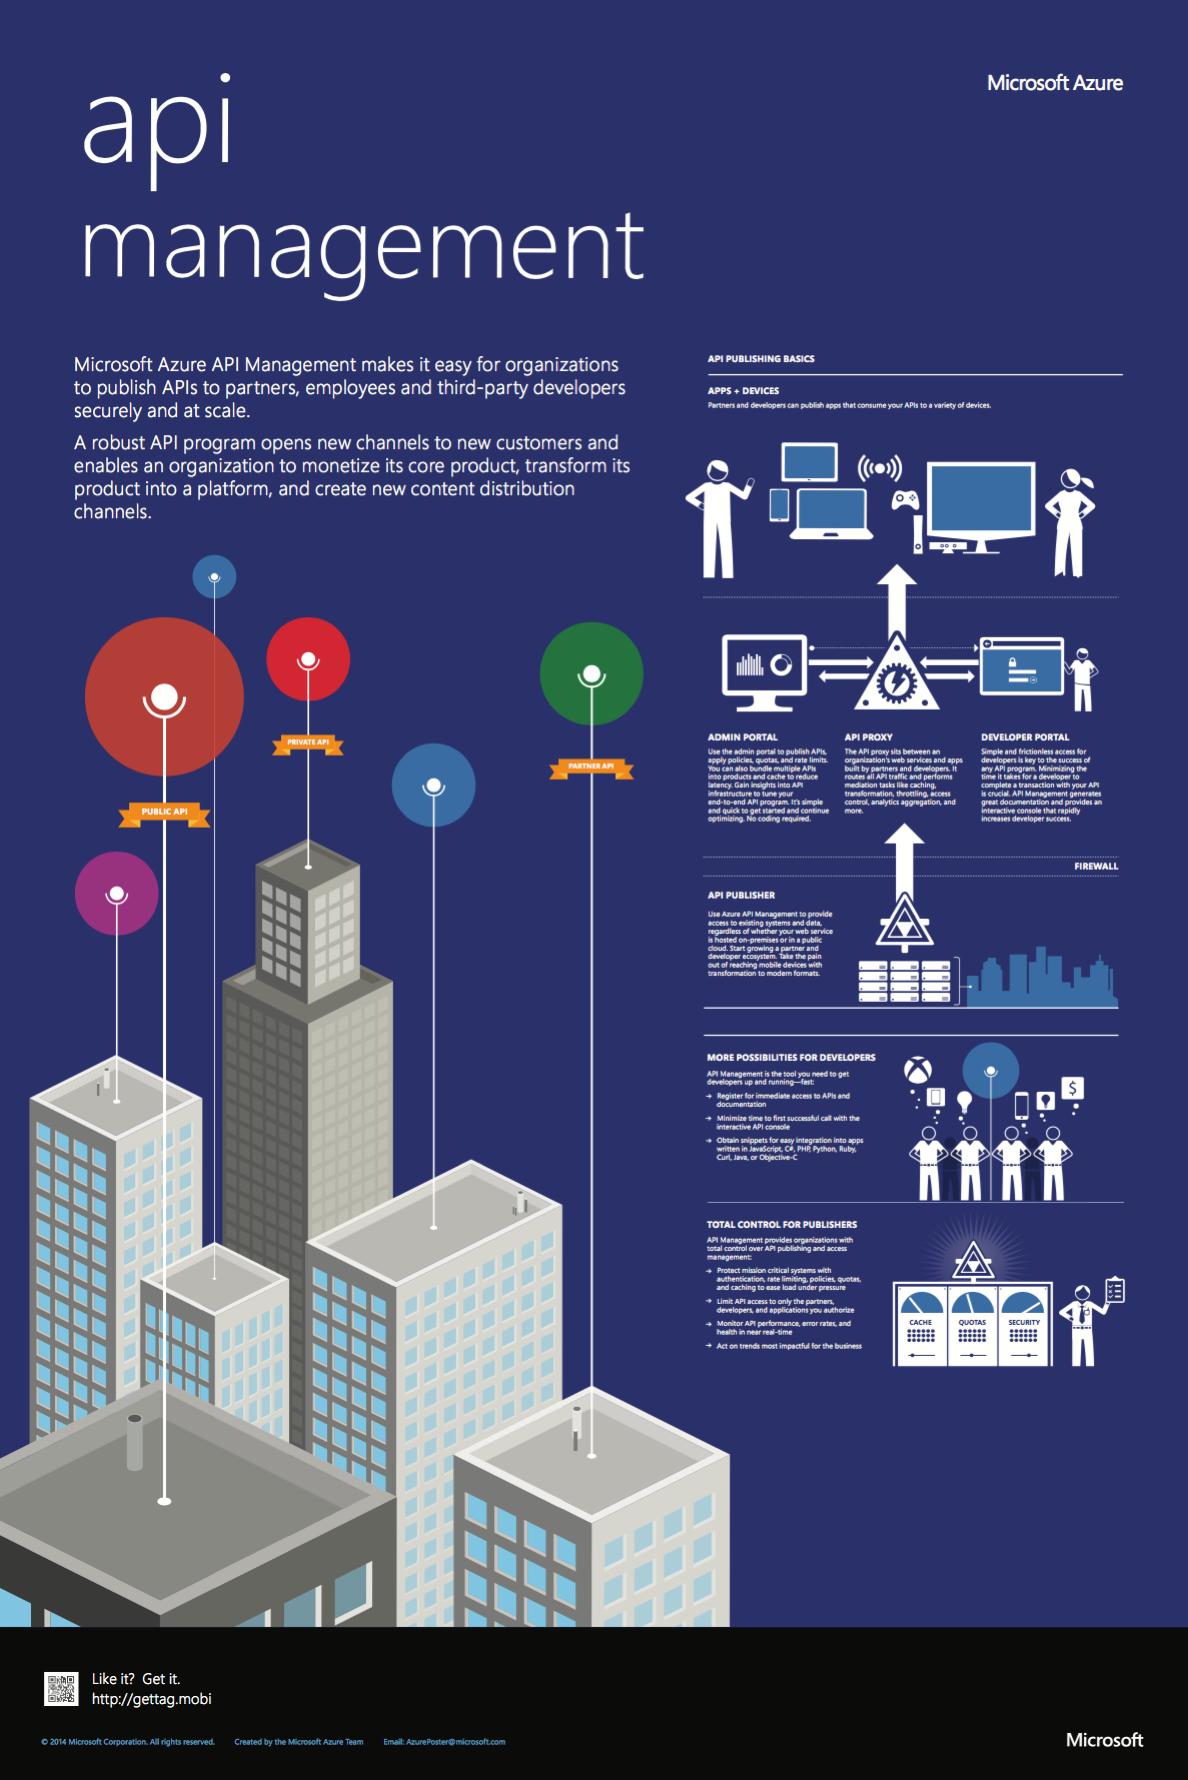 Azure Infographic: API Management – Build Azure